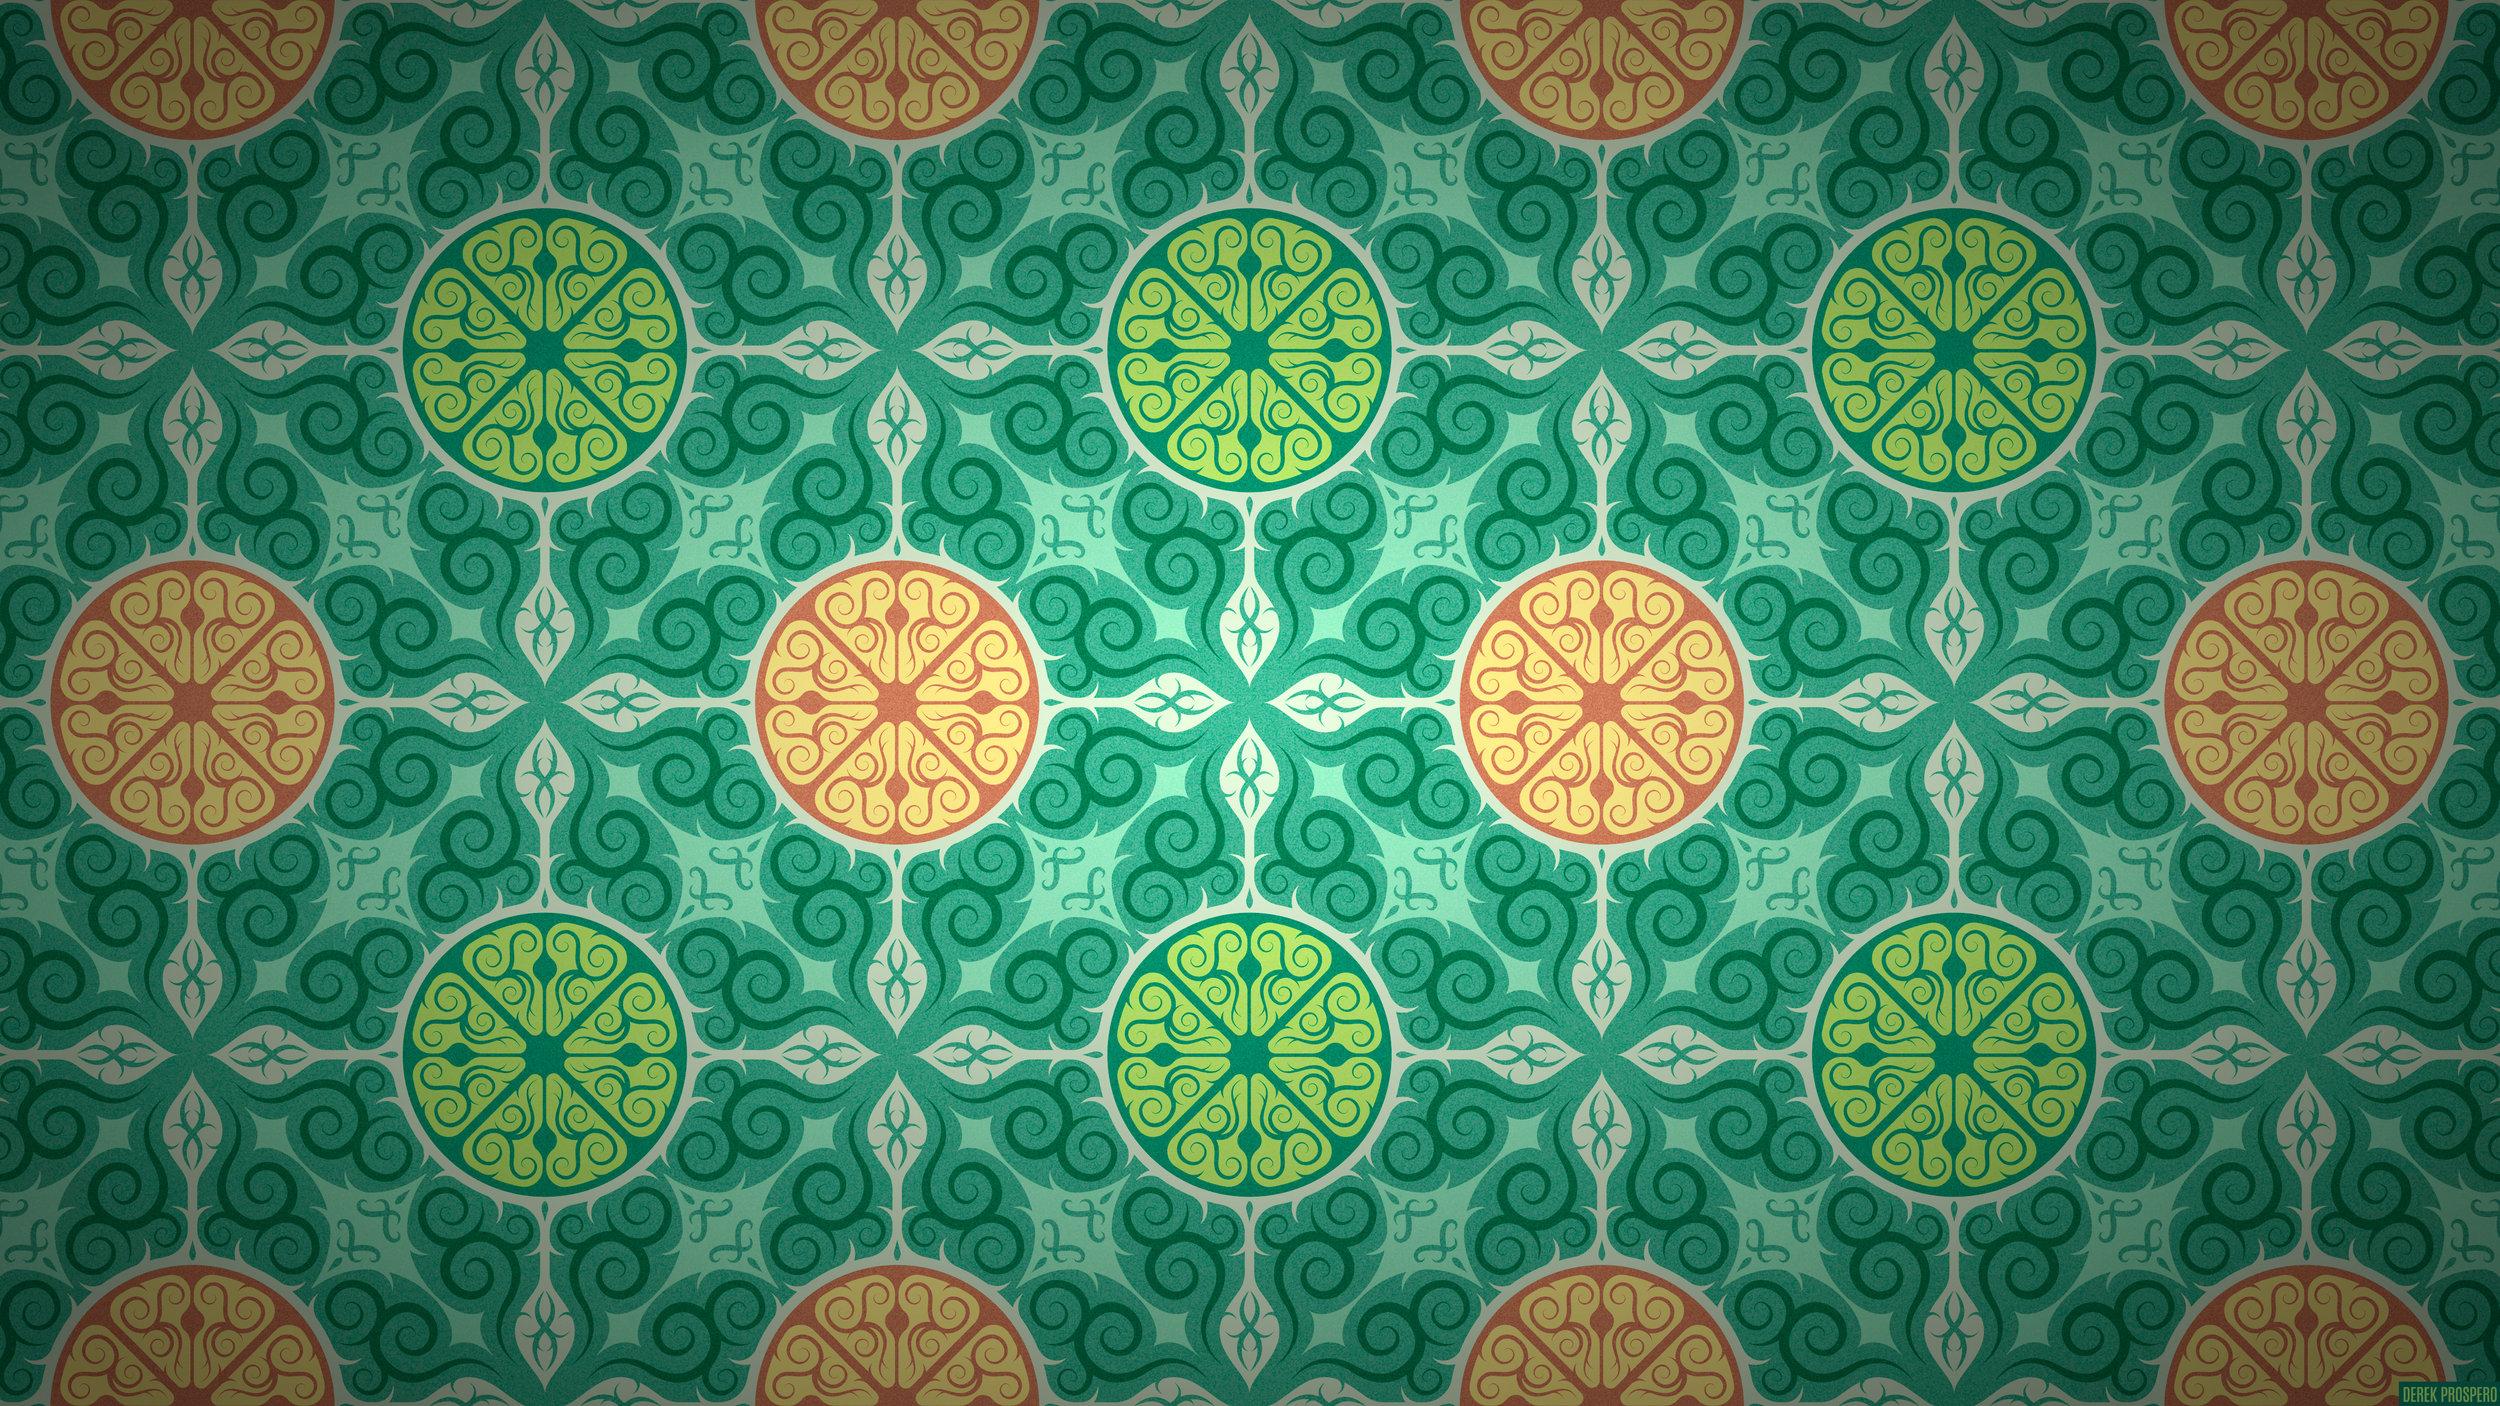 pattern-007.jpg